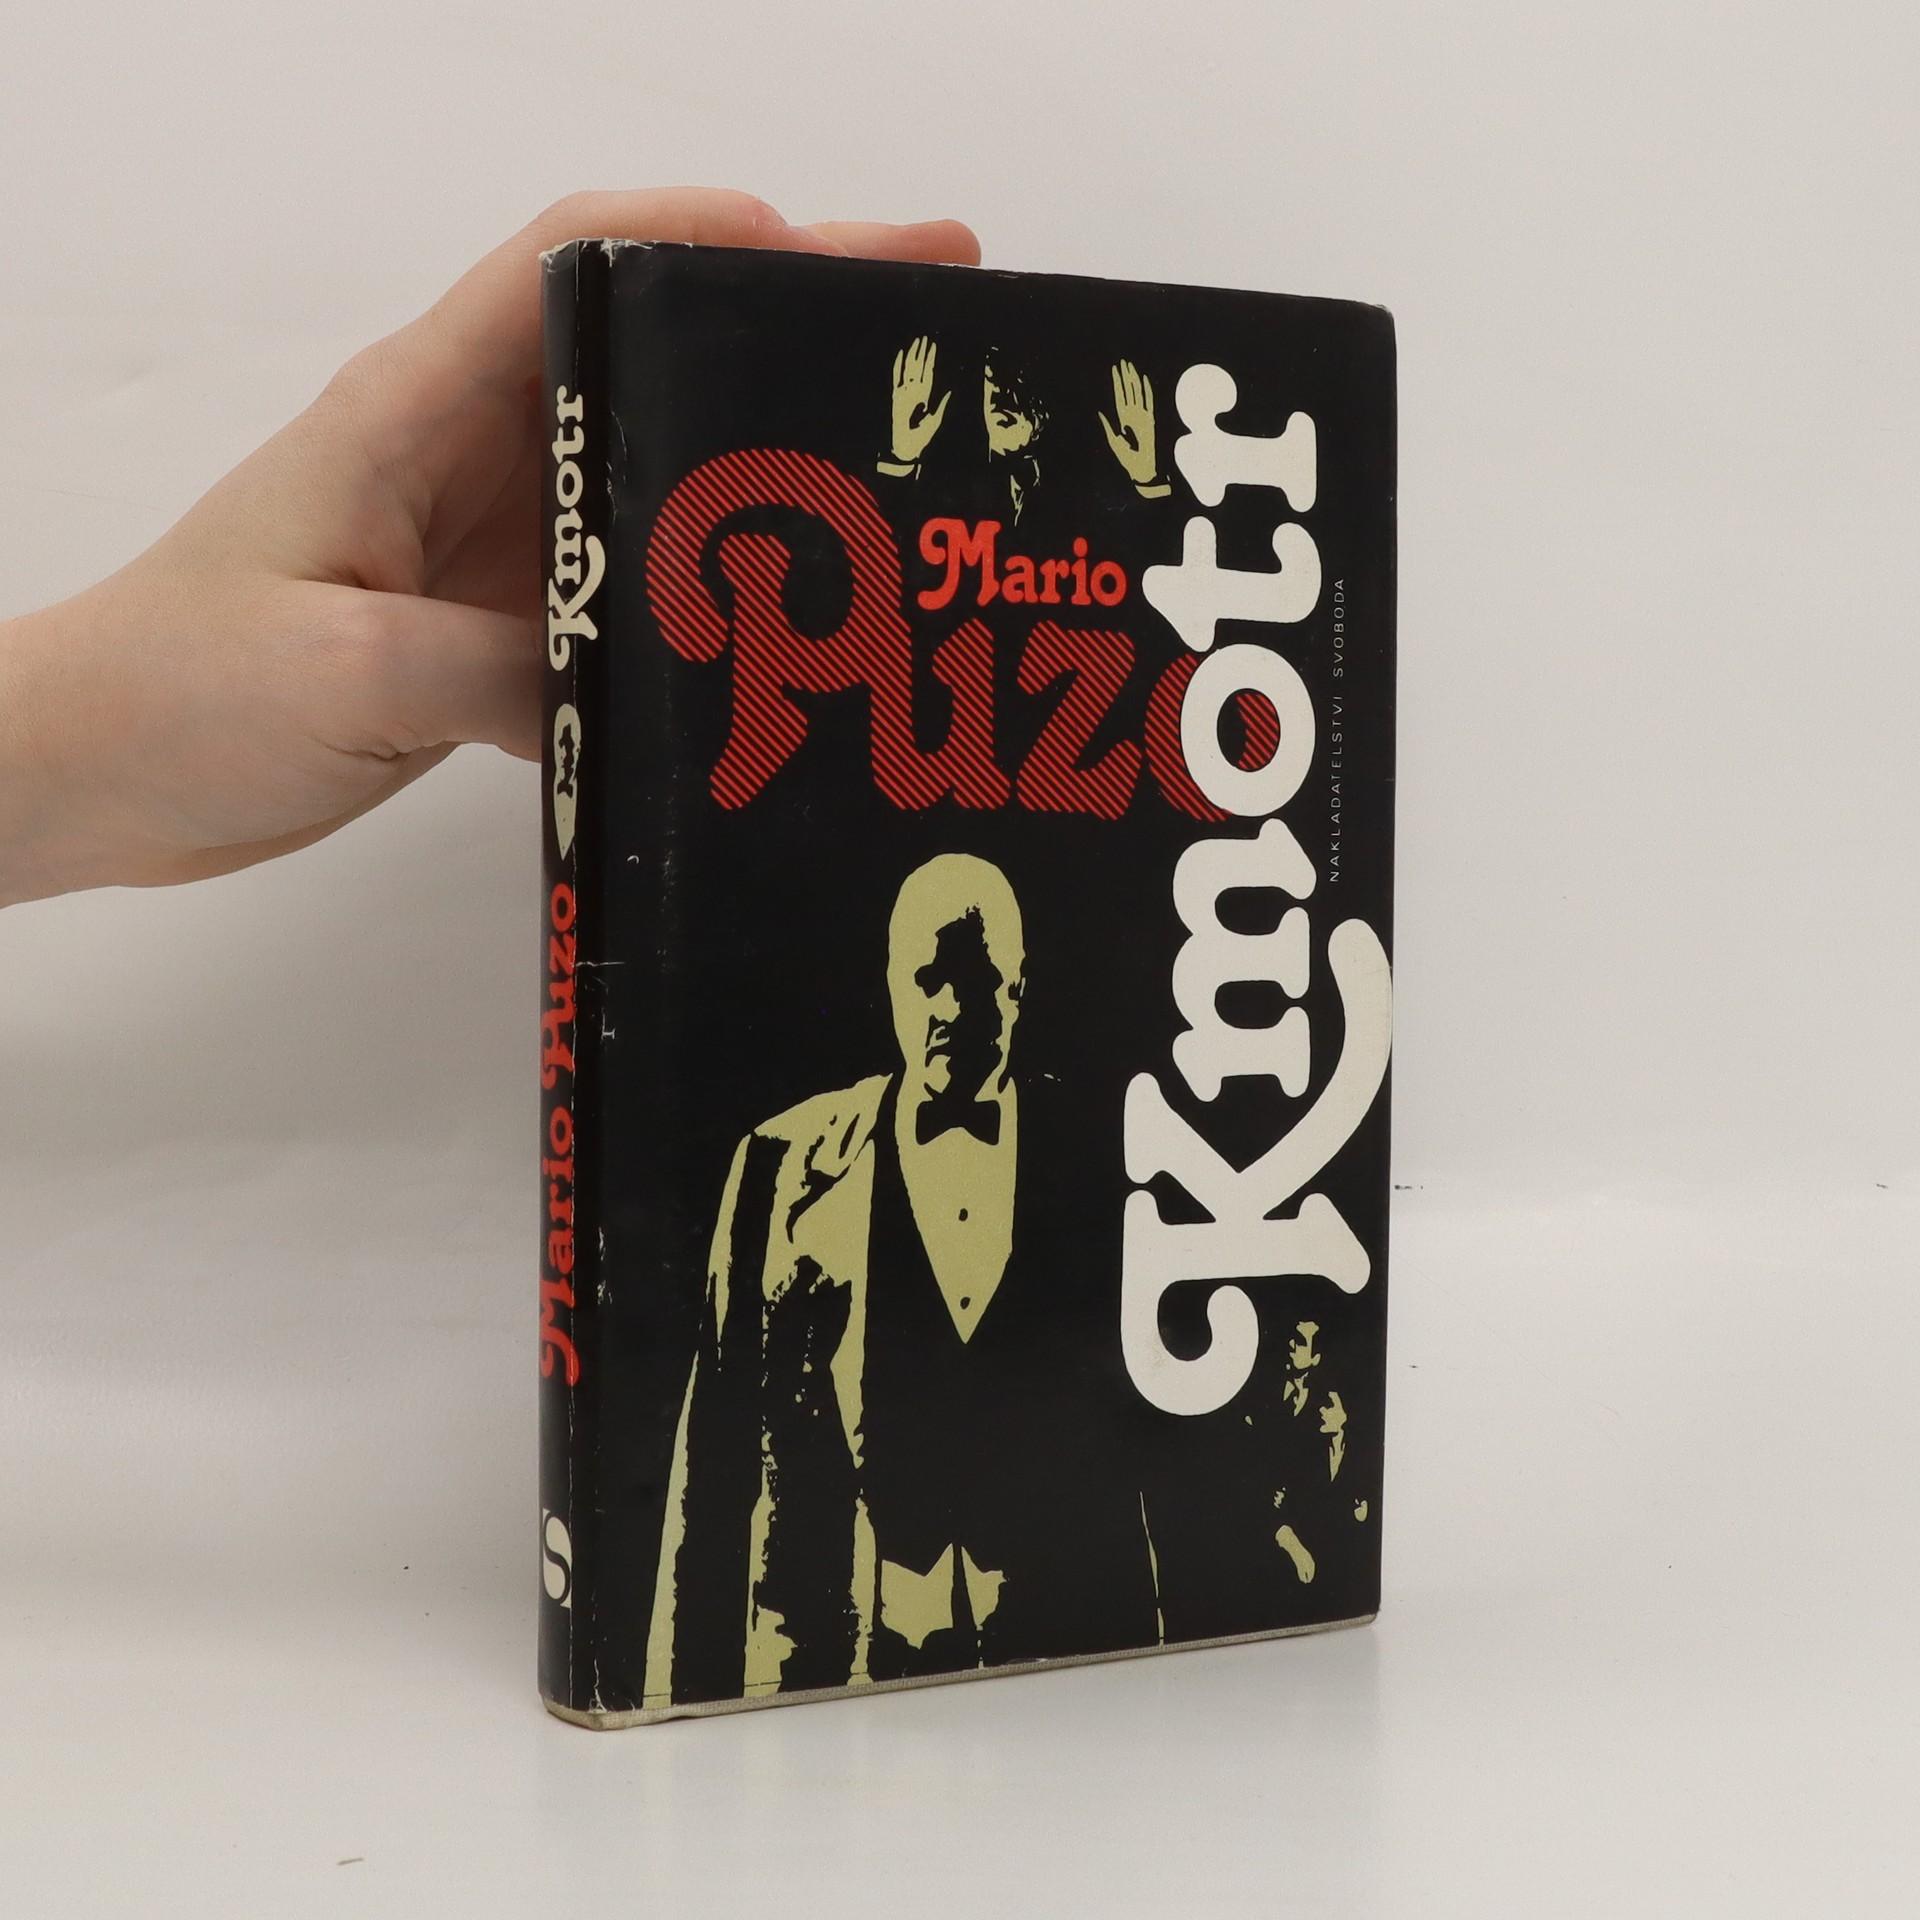 antikvární kniha Kmotr, 1991